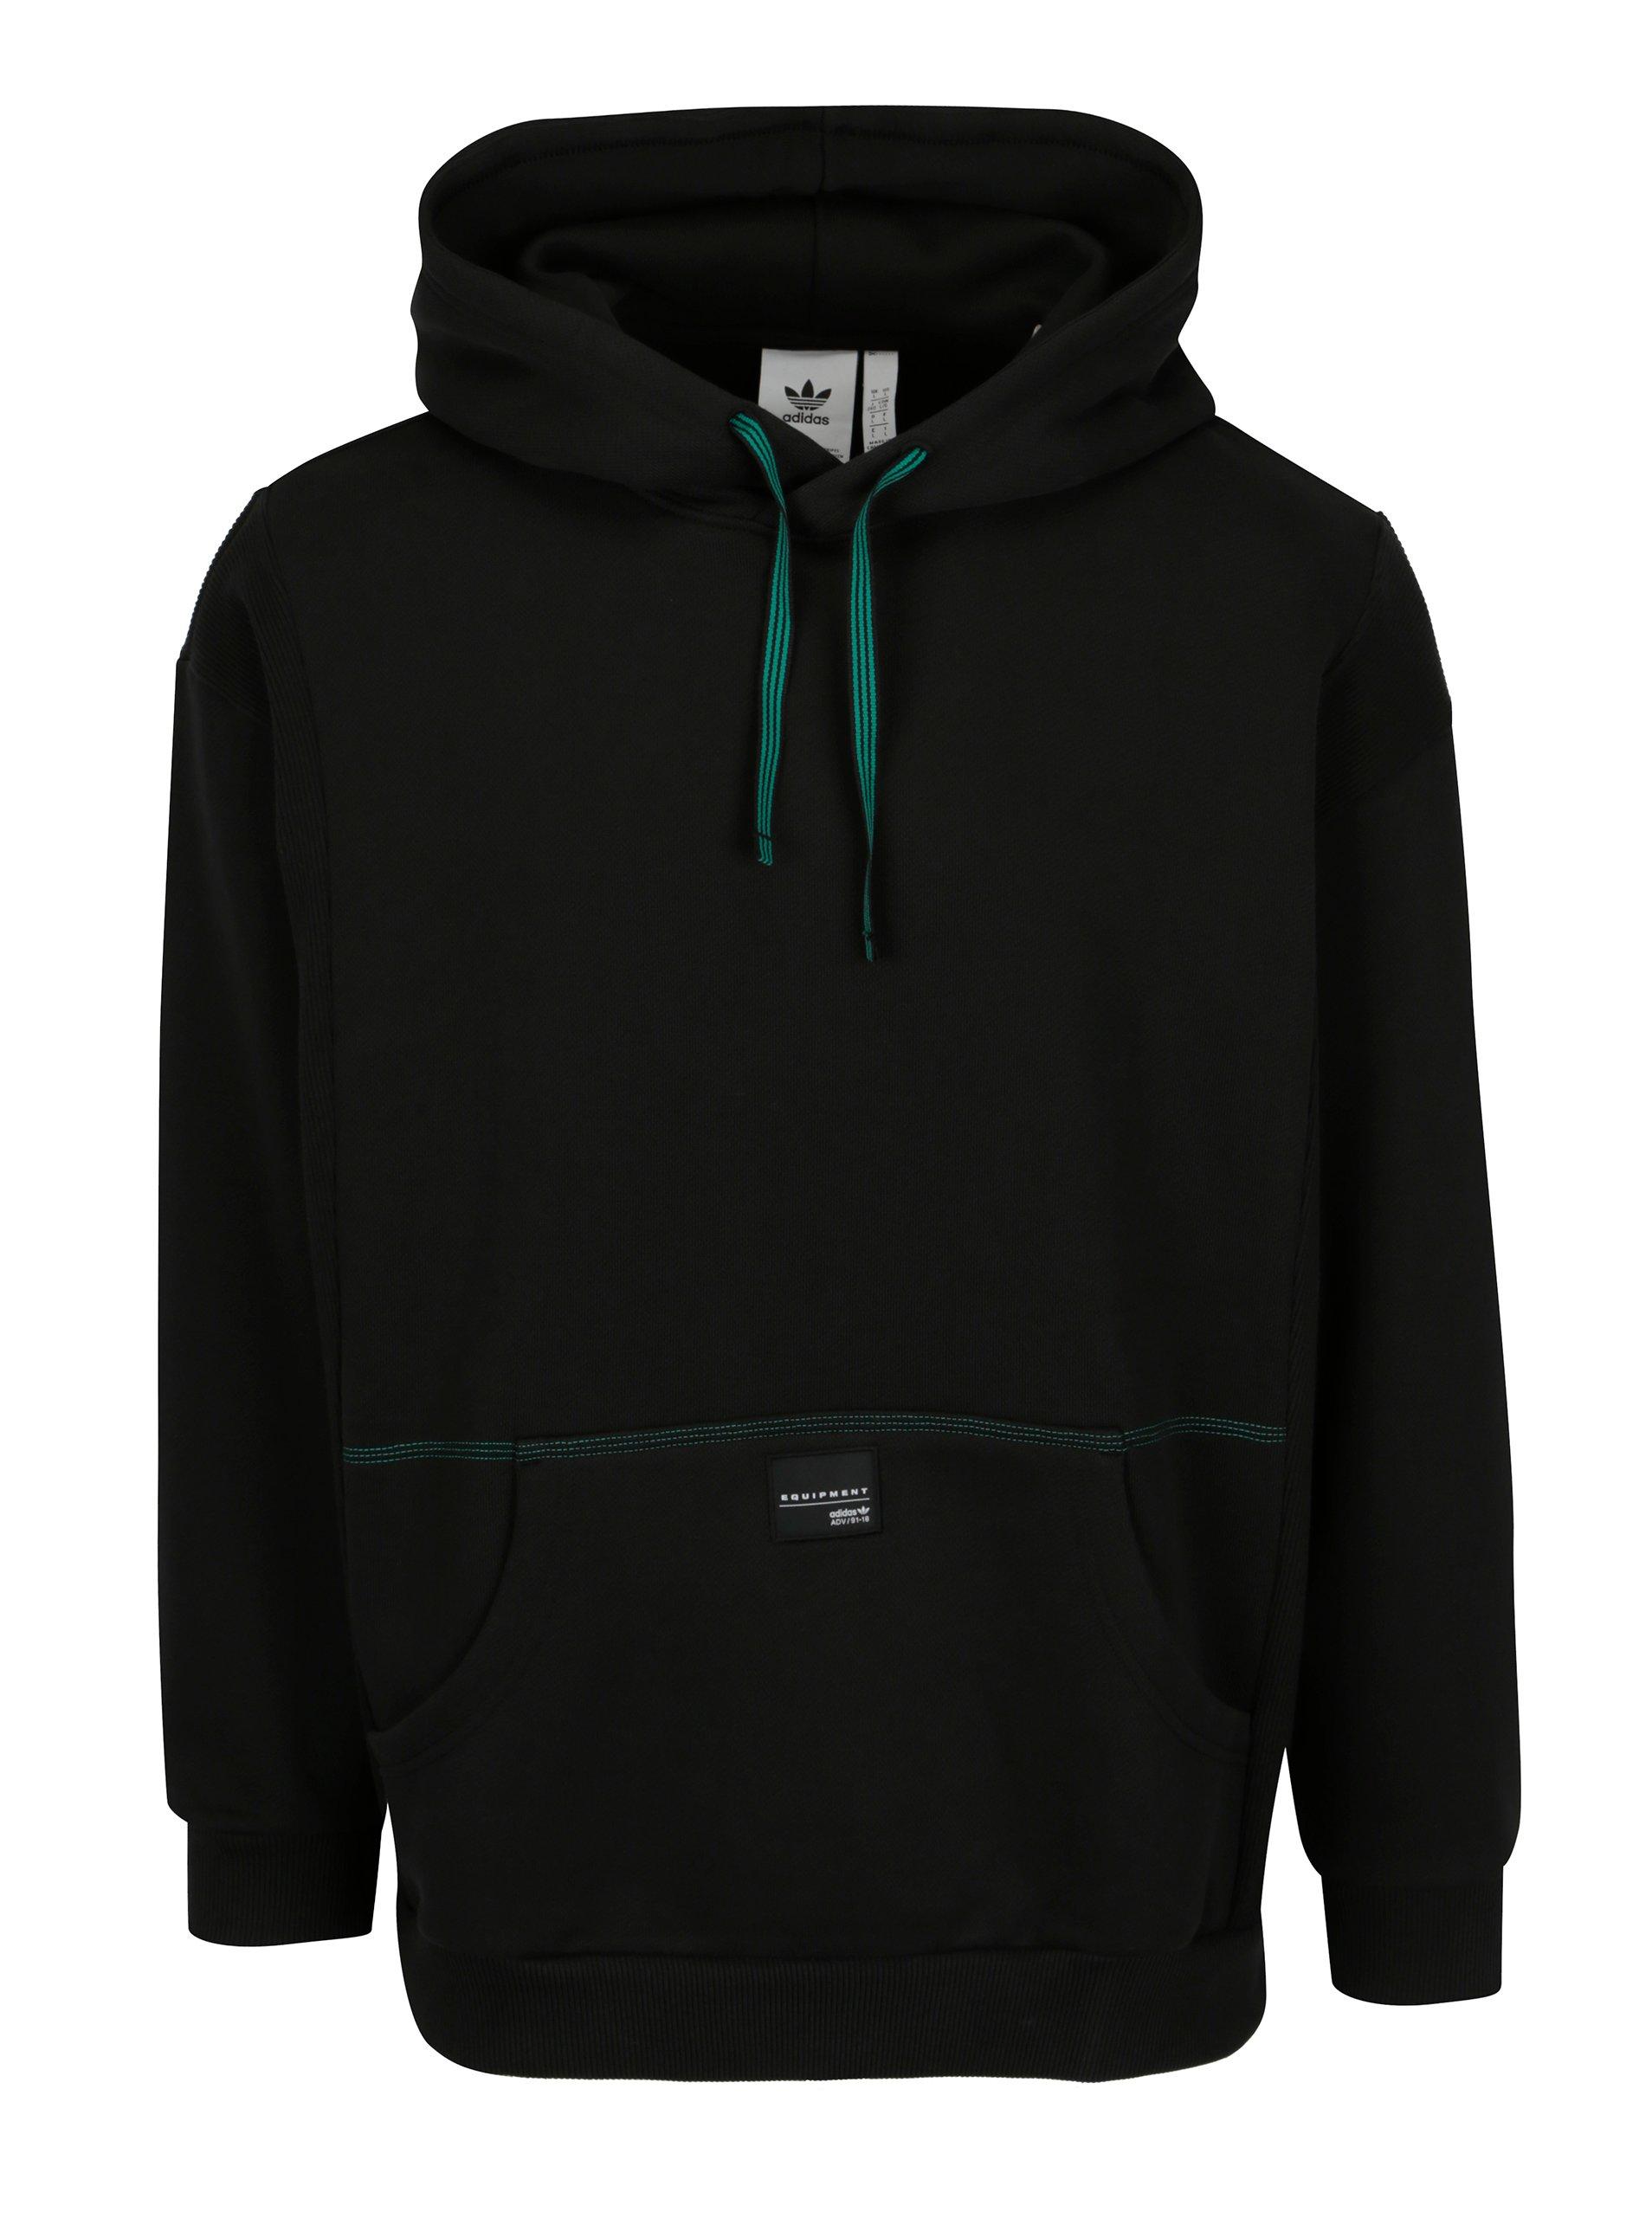 Čierna pánska mikina s kapucňou adidas Originals  335b10e6d99